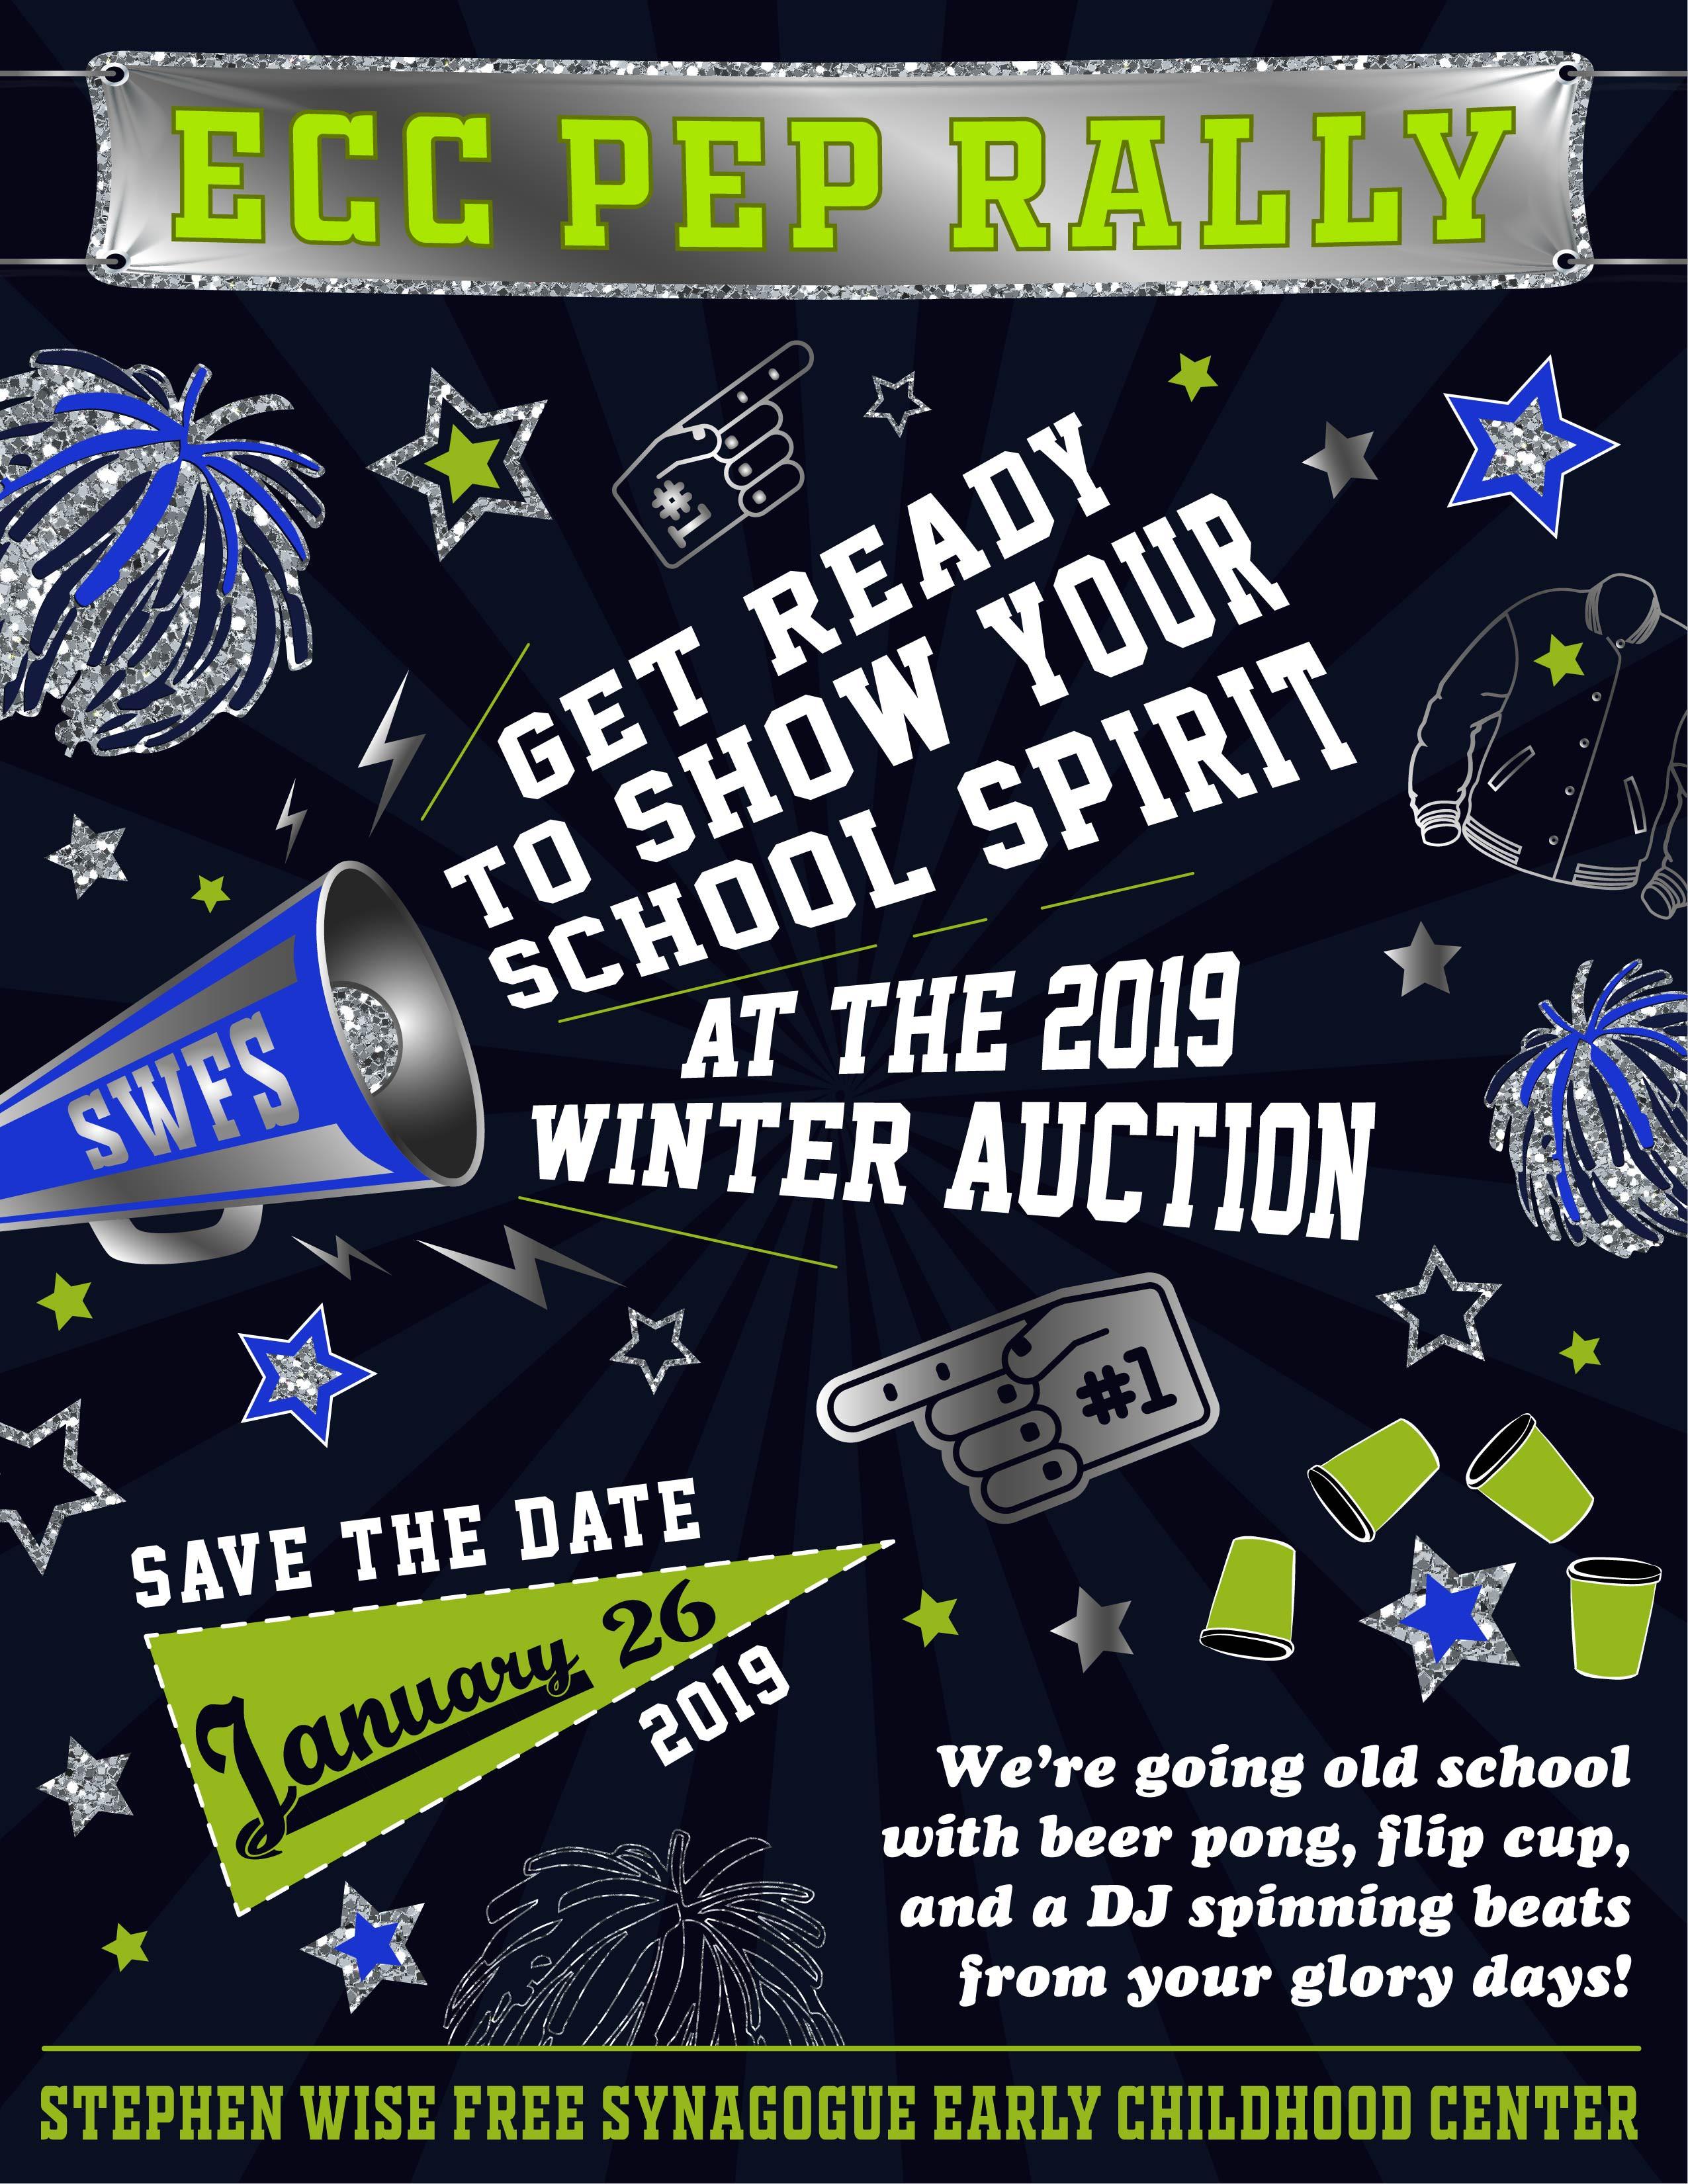 Pep rally theme school fundraiser invitation